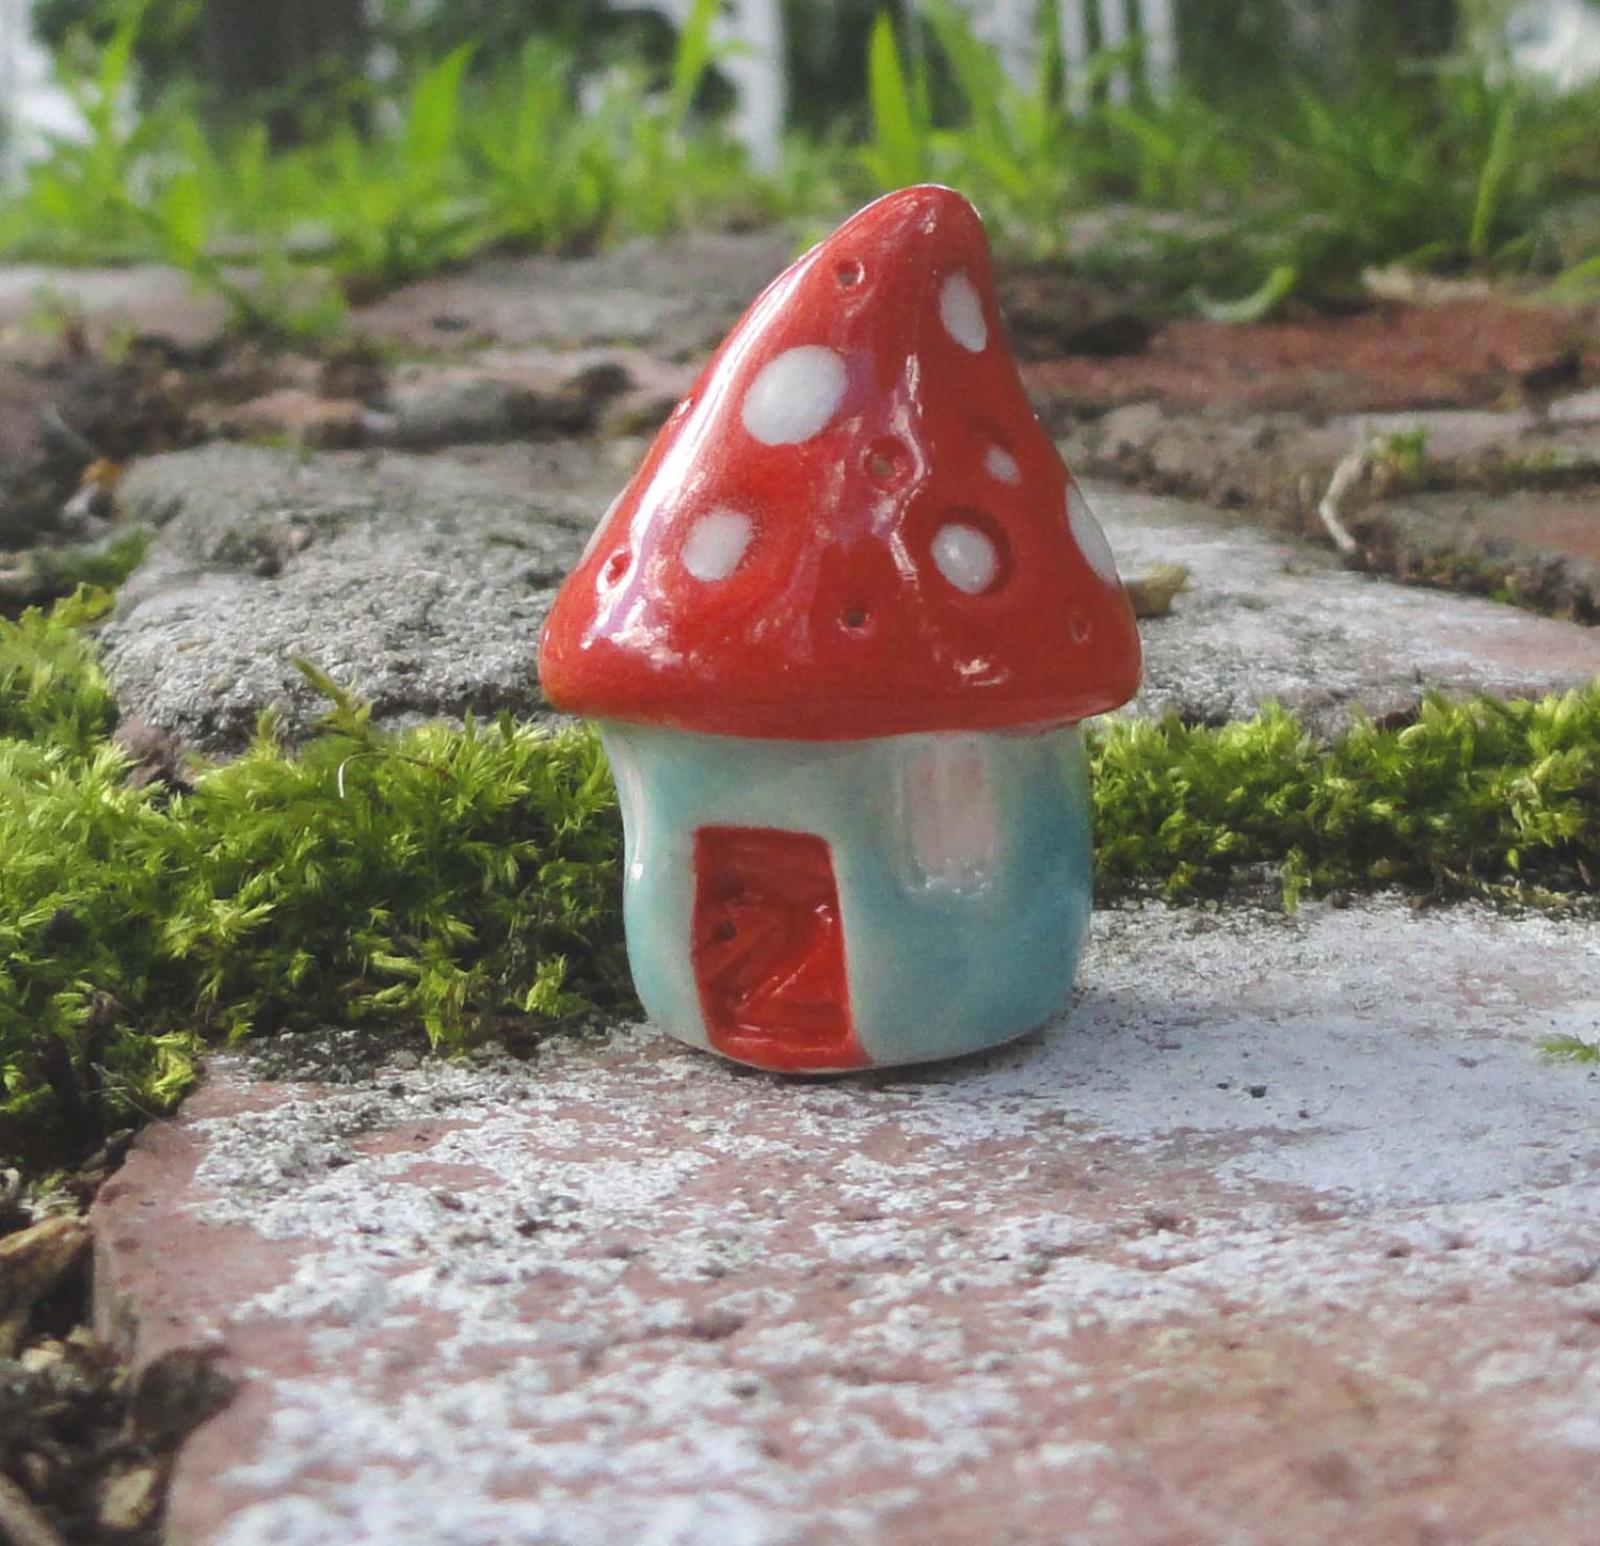 Mushroom Gnome Home Ceramic Pottery Sculpture Clay Fairy House Garden Miniature Terrarium Mushroom Green Beatlebaby Beatlebaby Glassworks